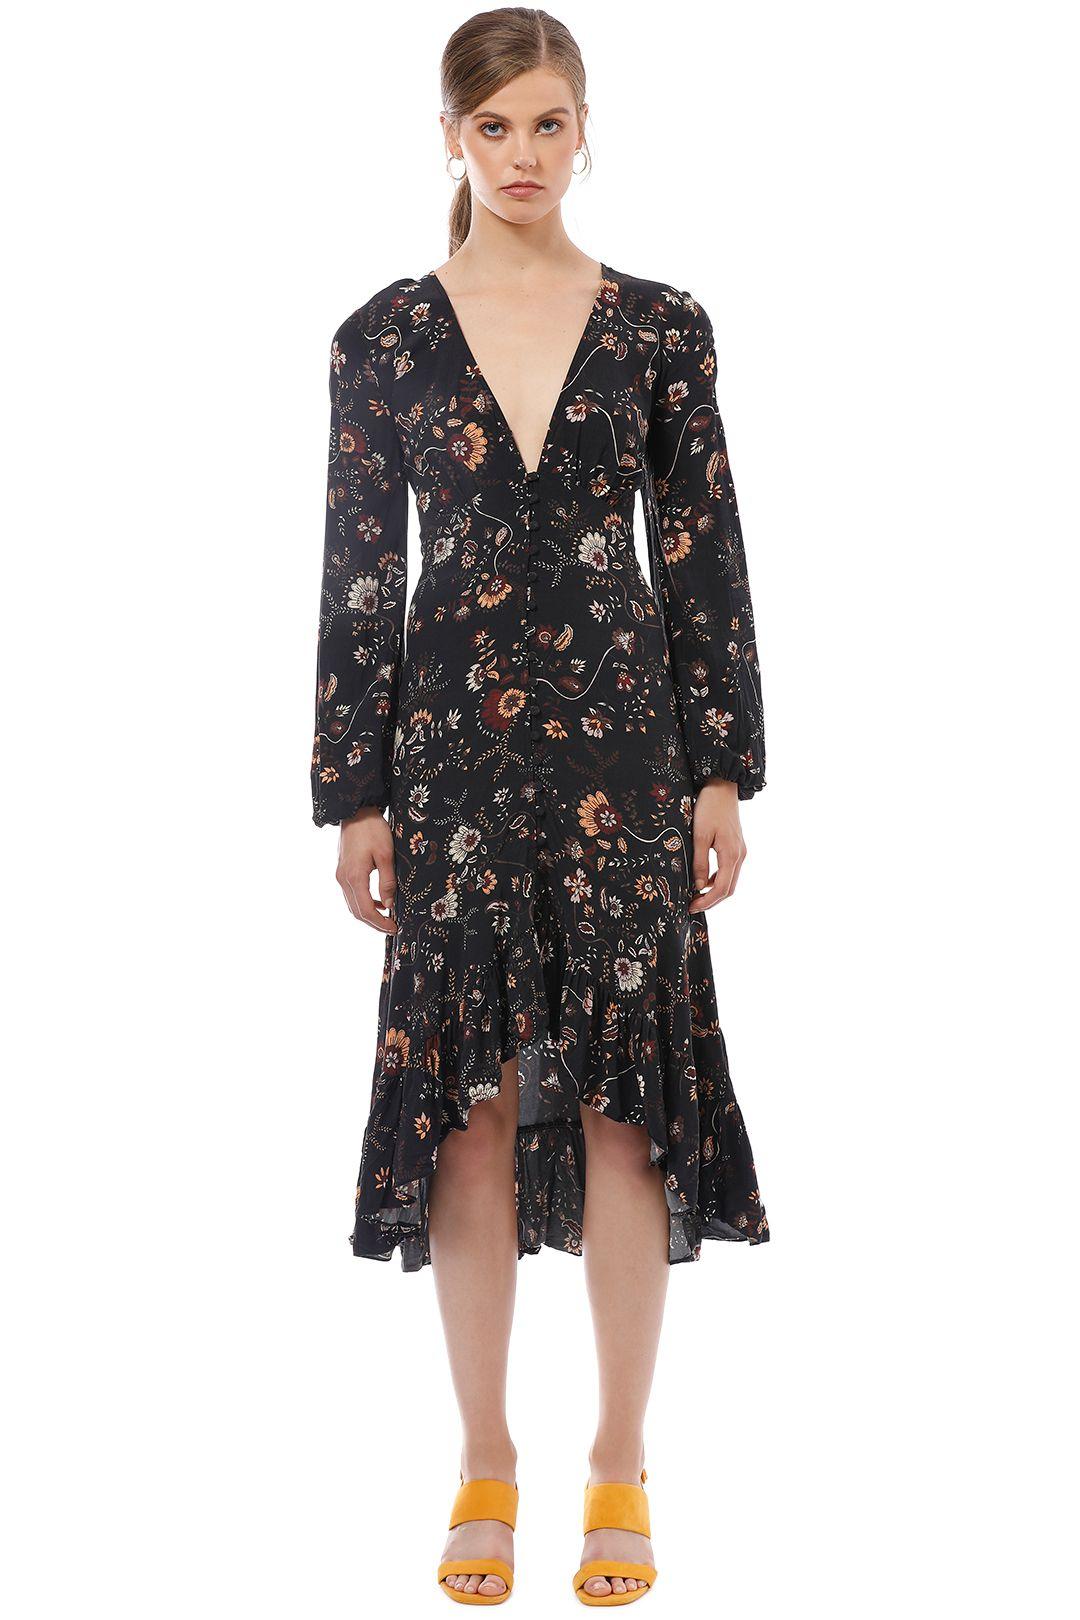 Rodeo Show - Mireya Midi Dress - Black Floral - Front